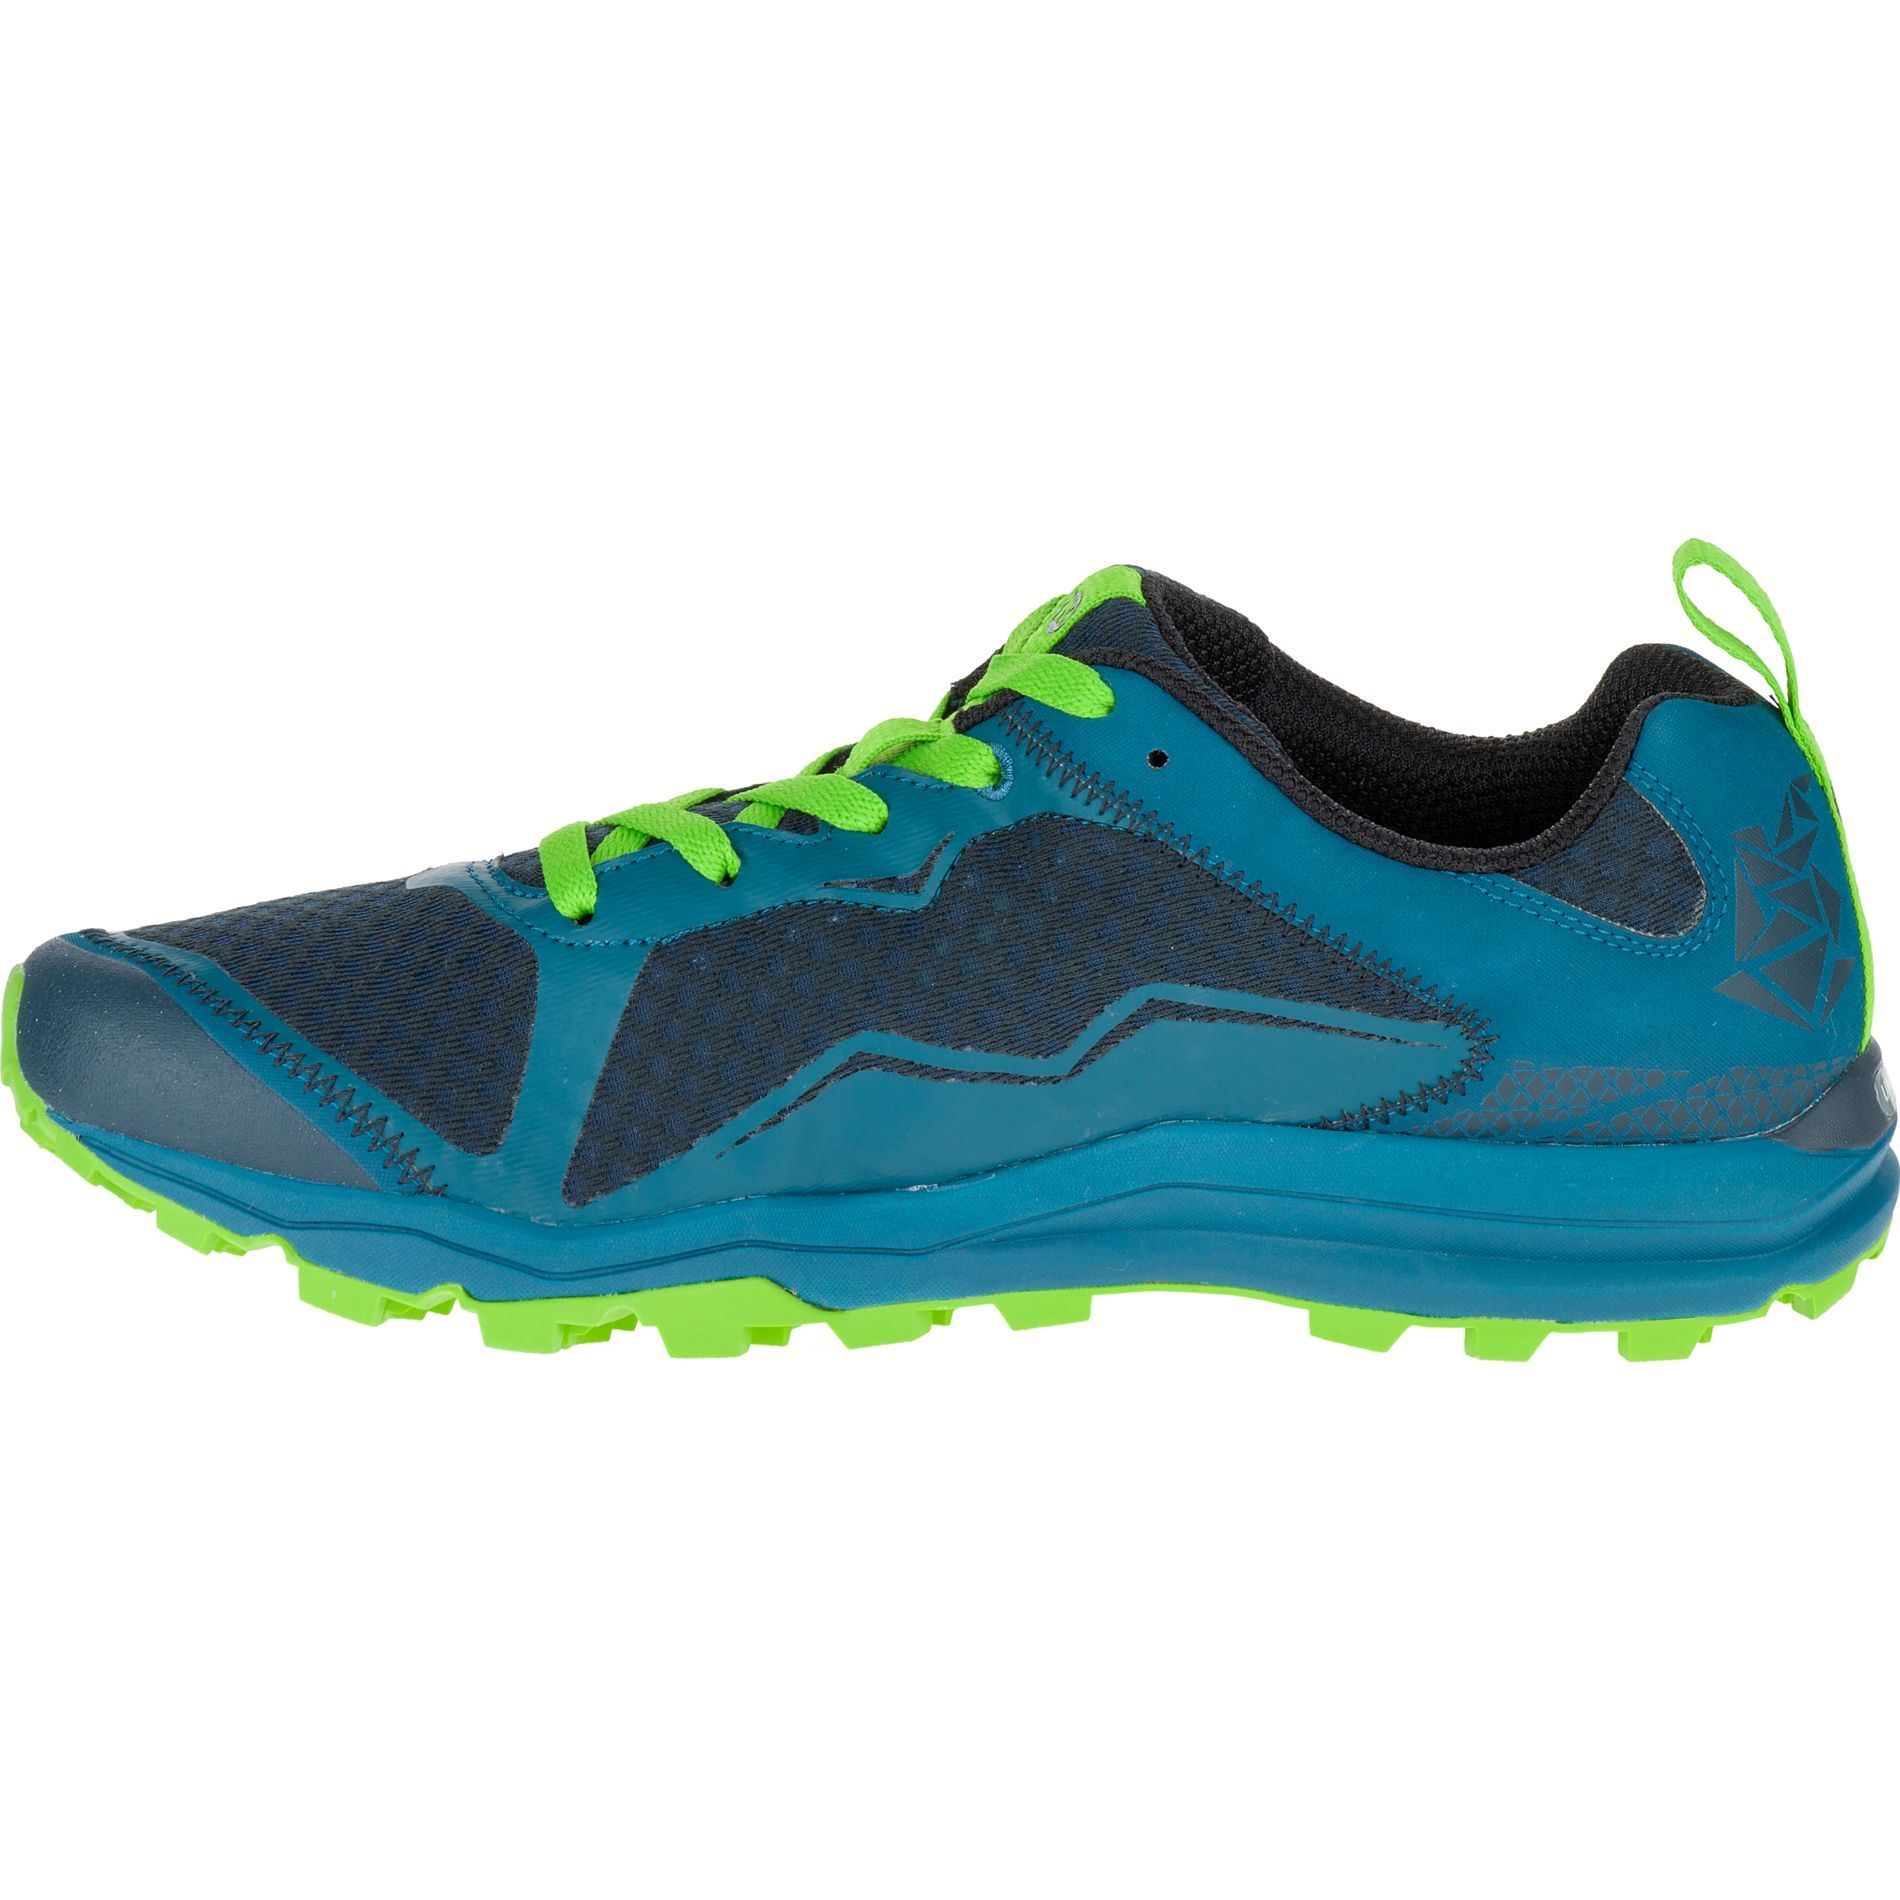 Merrell Men S All Out Crush Trail Running Shoe